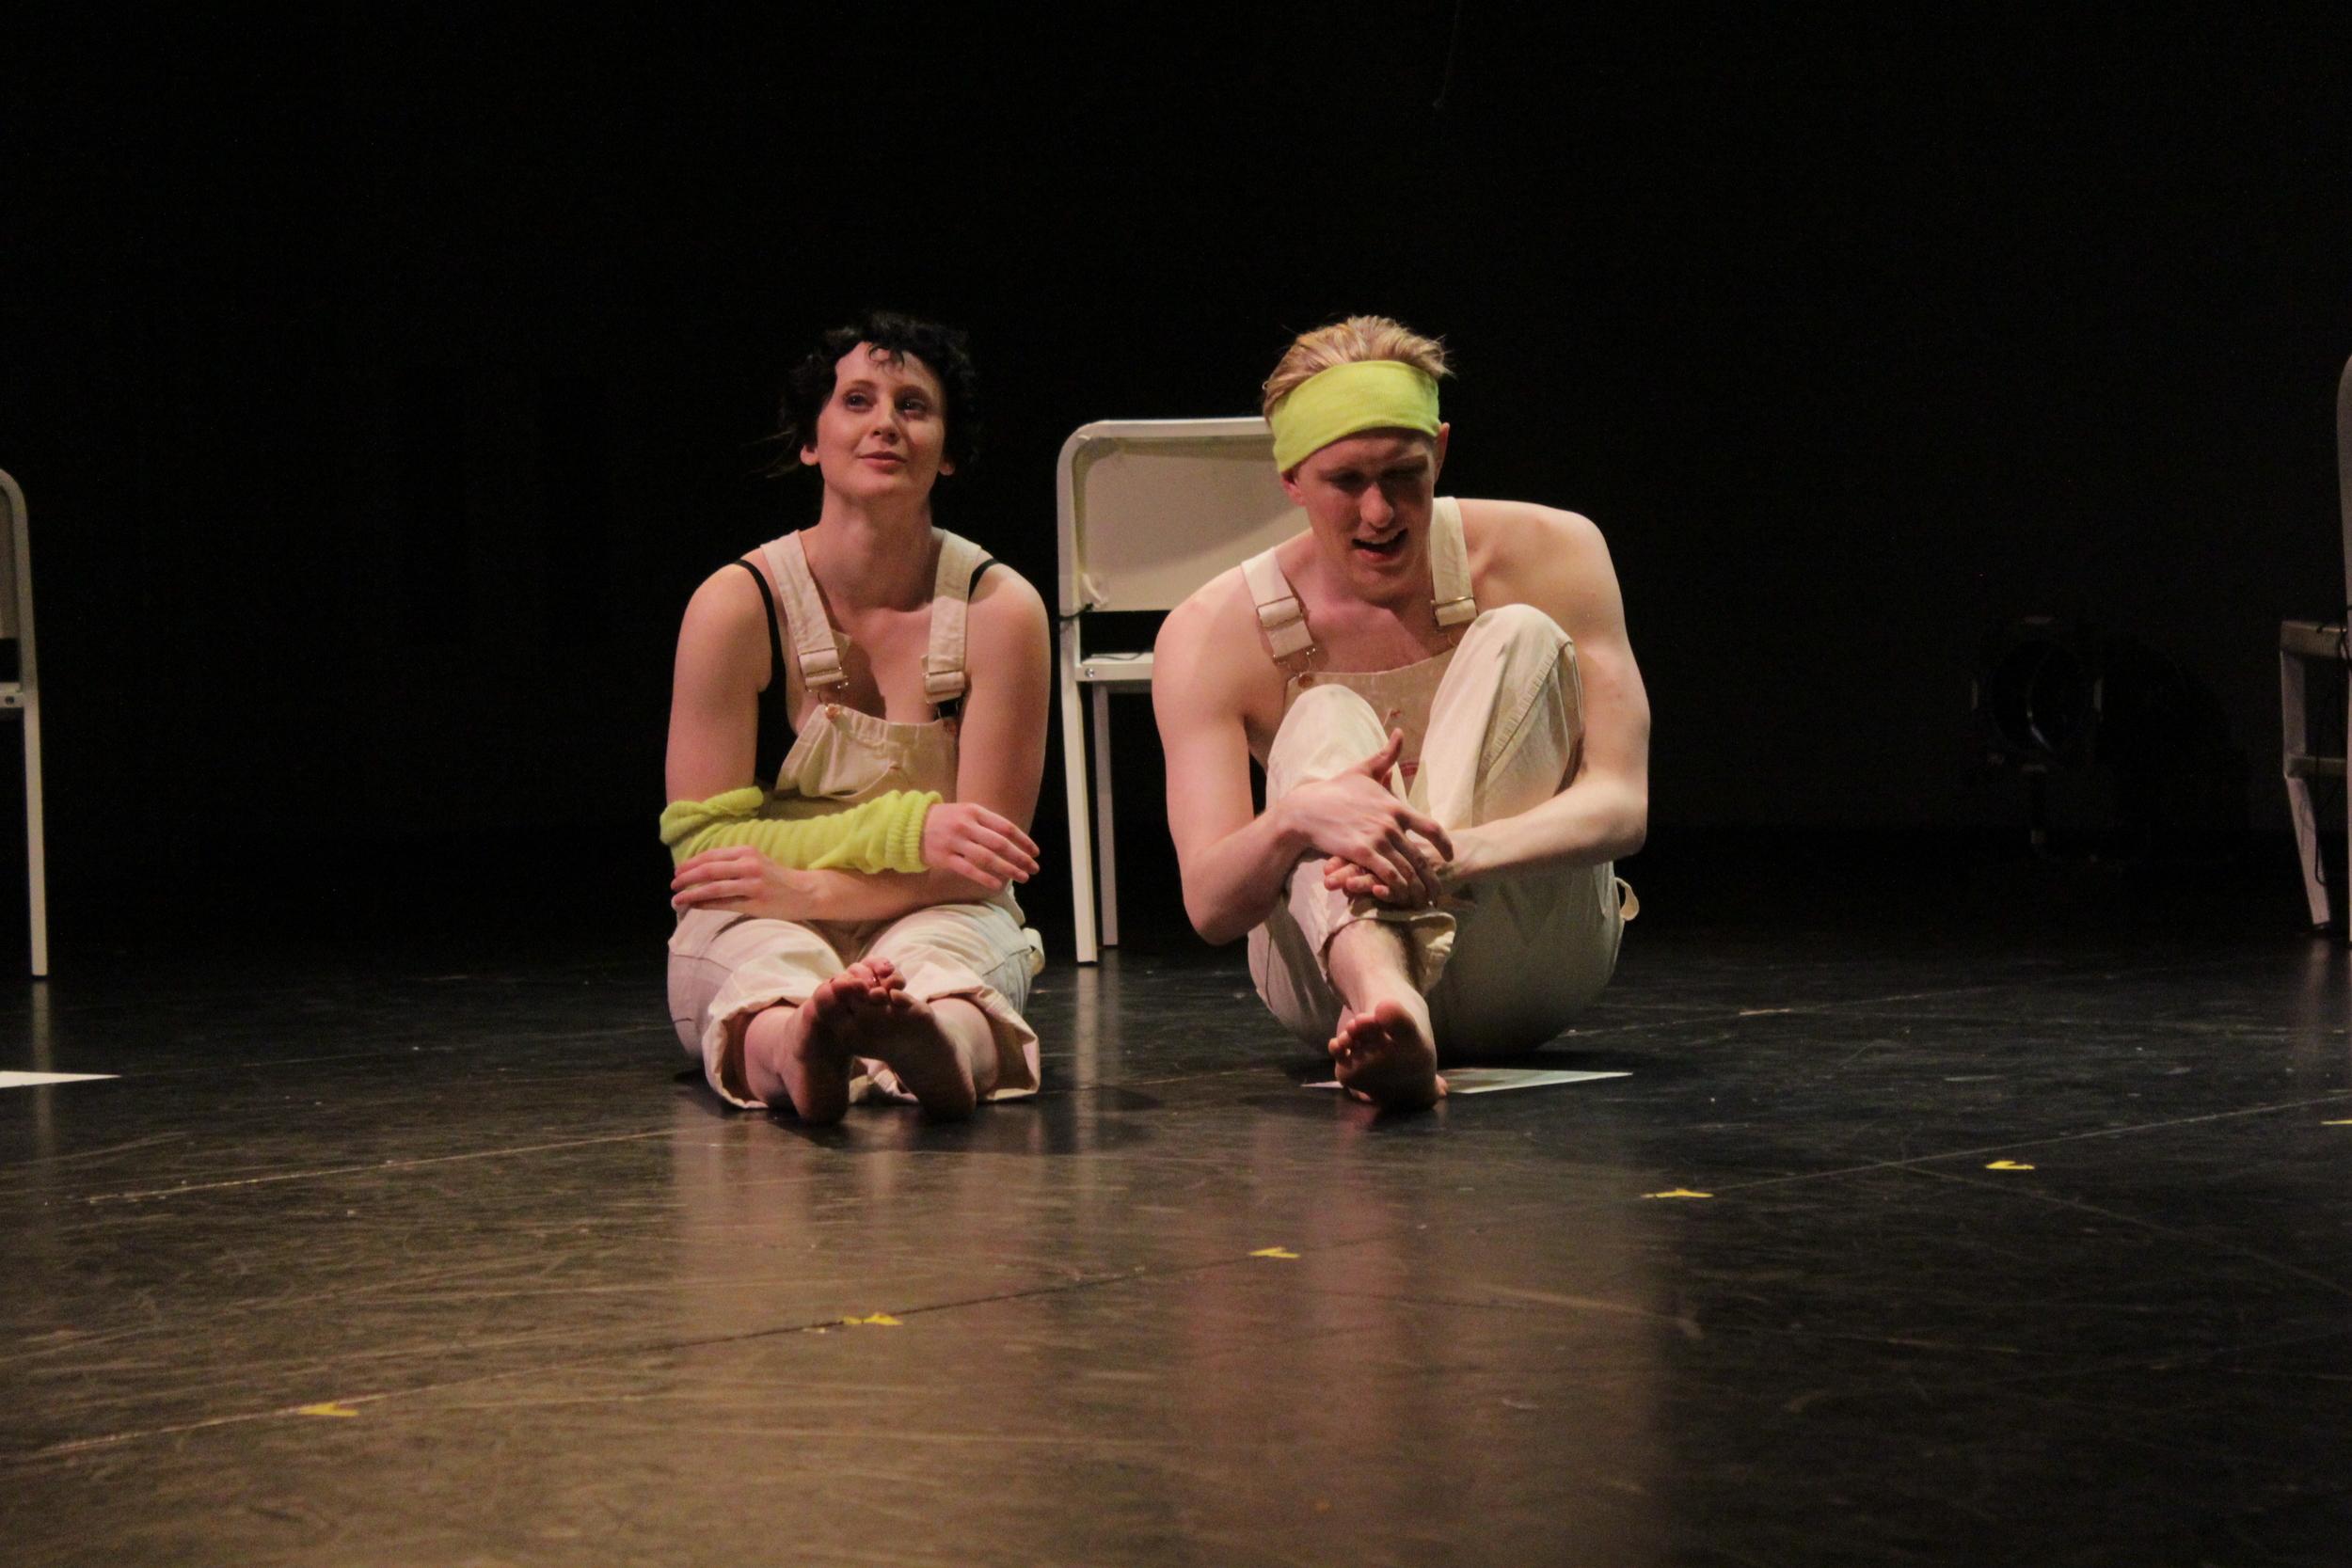 Guests: A Gestural Ballet